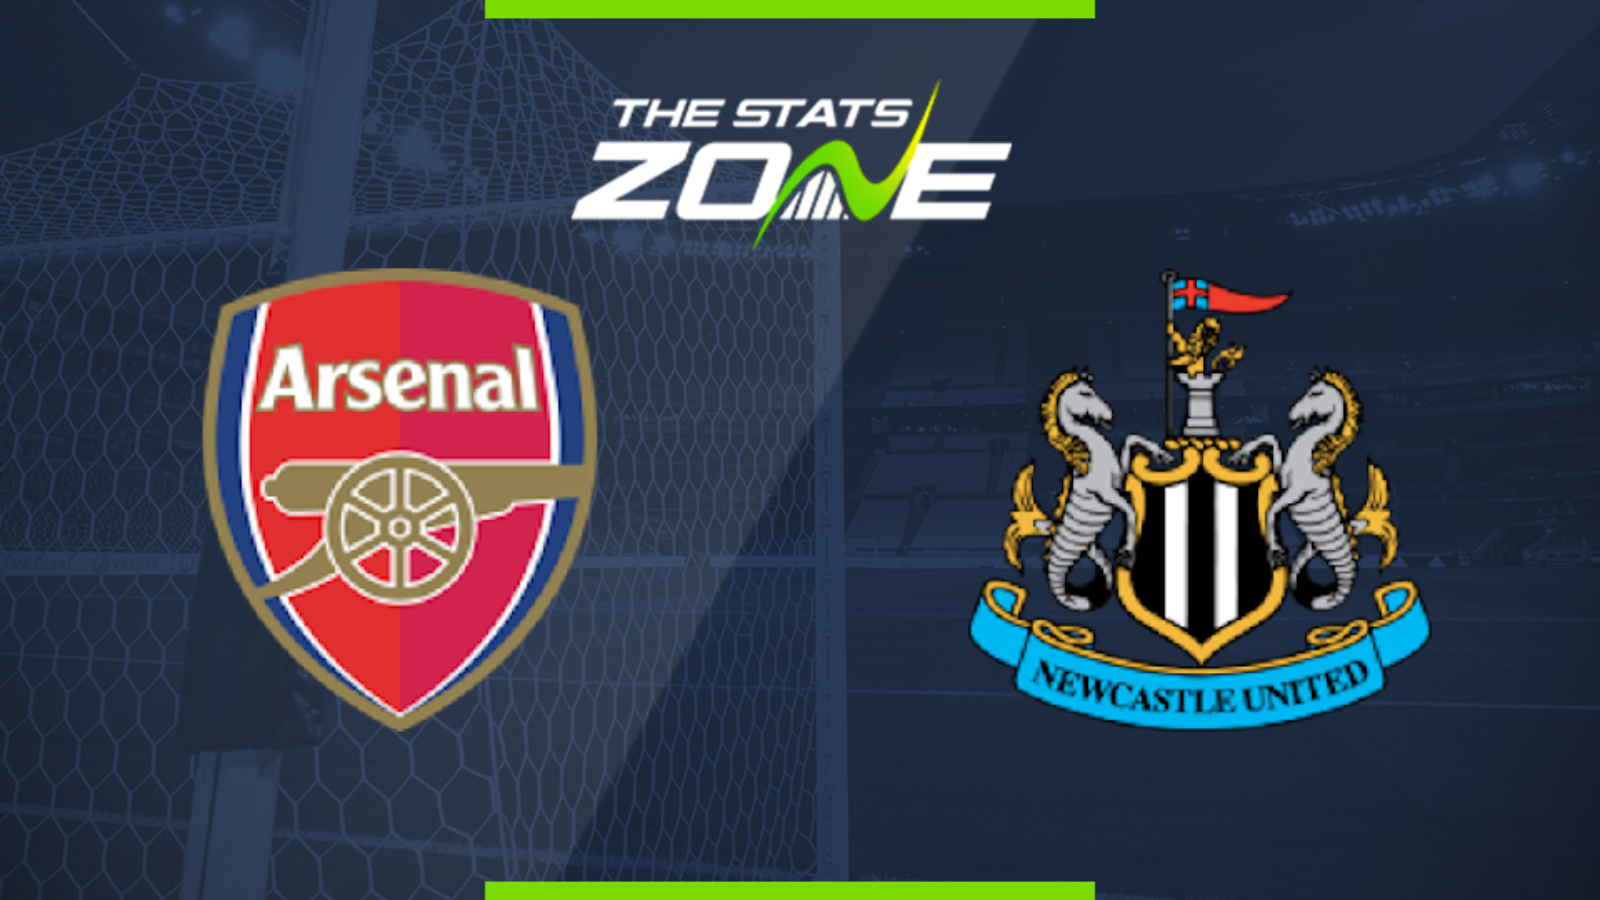 2019 20 Premier League Arsenal Vs Newcastle Preview Prediction The Stats Zone